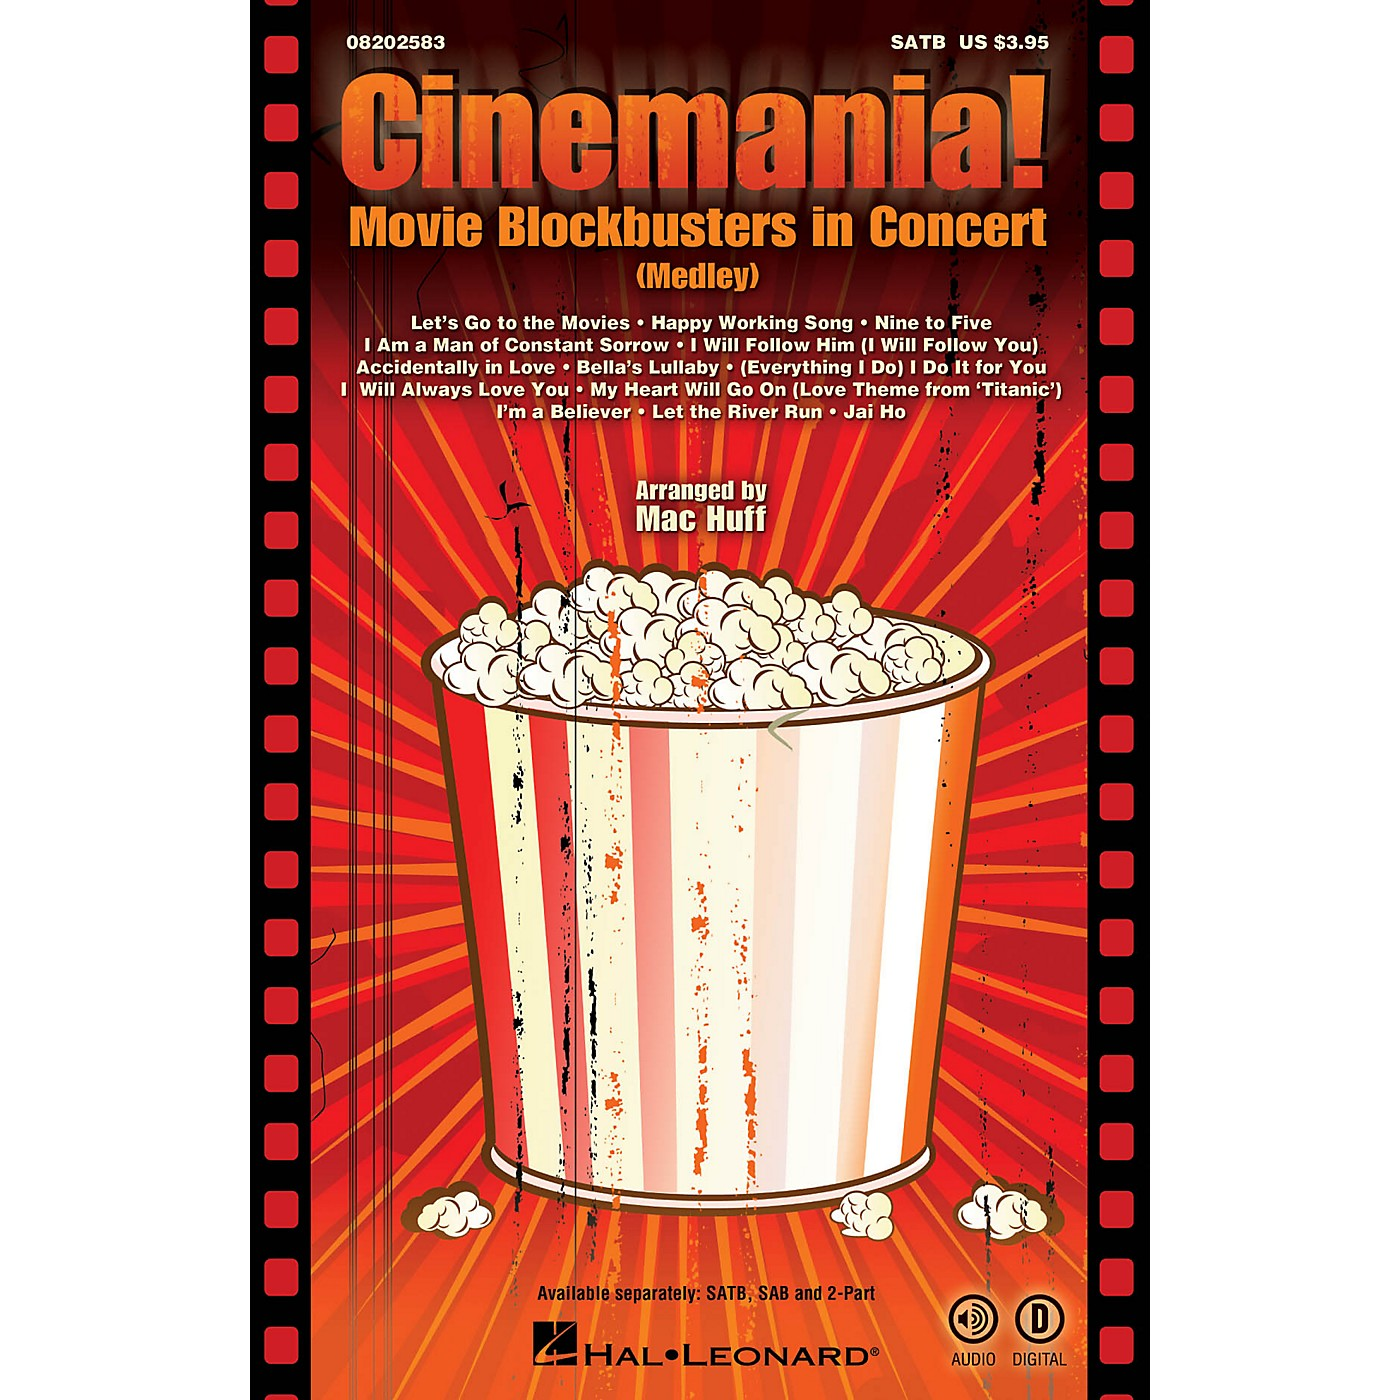 Hal Leonard Cinemania! Movie Blockbusters in Concert (Medley) 2-Part Arranged by Mac Huff thumbnail